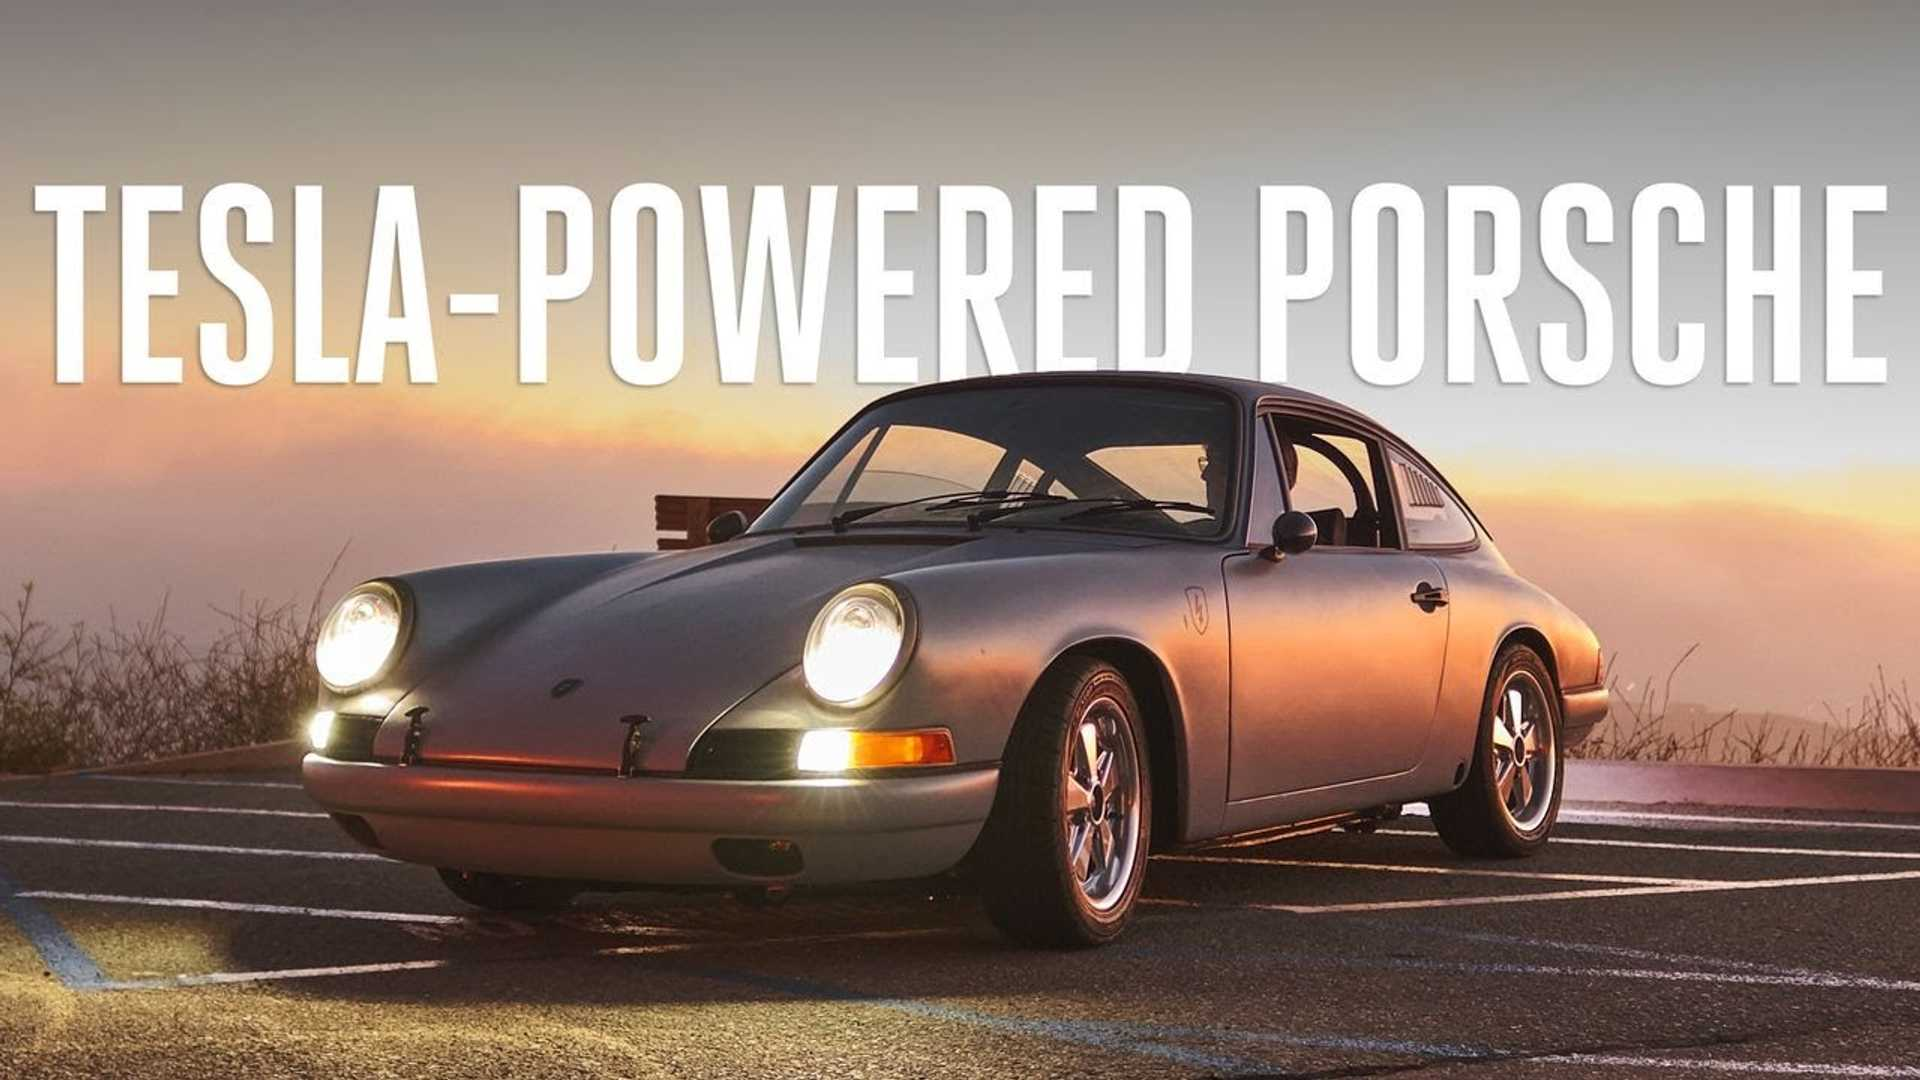 This Video Of A Tesla-Powered Porsche 912 Is A Must-Watch